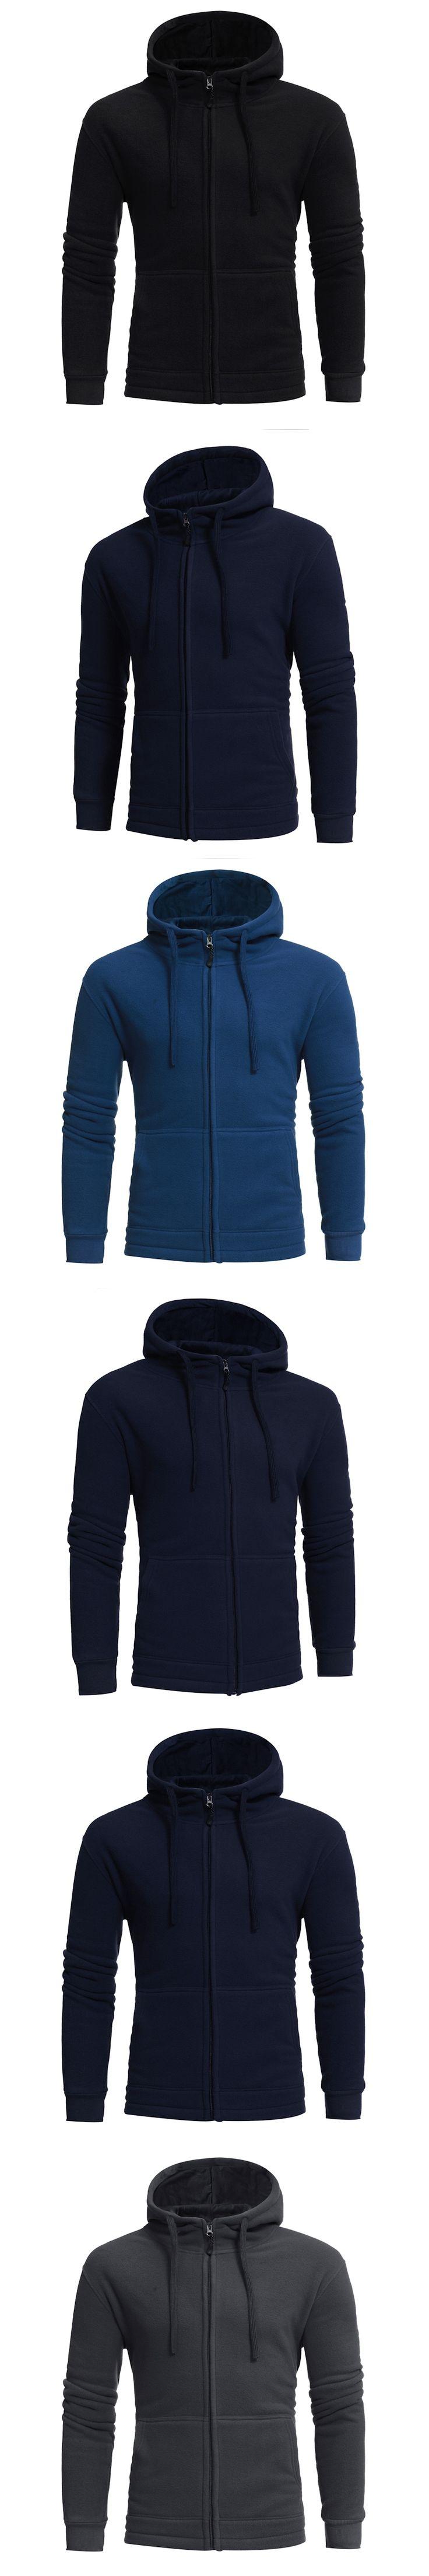 2017 New Mens Hoodies Sweatshirts Winter Plus Velvet Coats Men Hoodies Warm Thicken Slim Fit Sporting Tracksuits Zipper placket